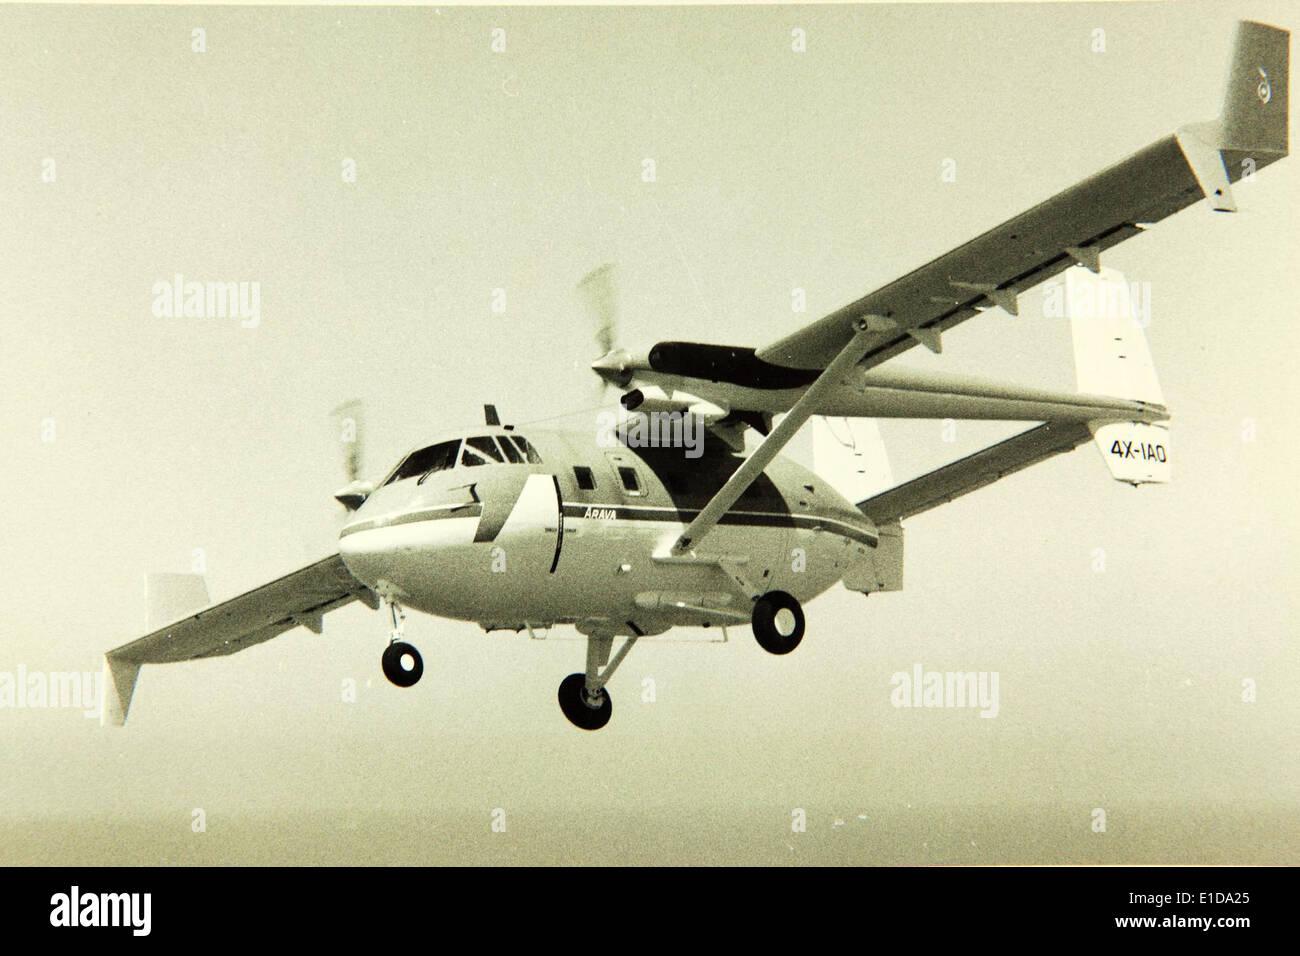 4x Iab 1972 Israel Aircraft Industries Iai 201 Arava C N 0004